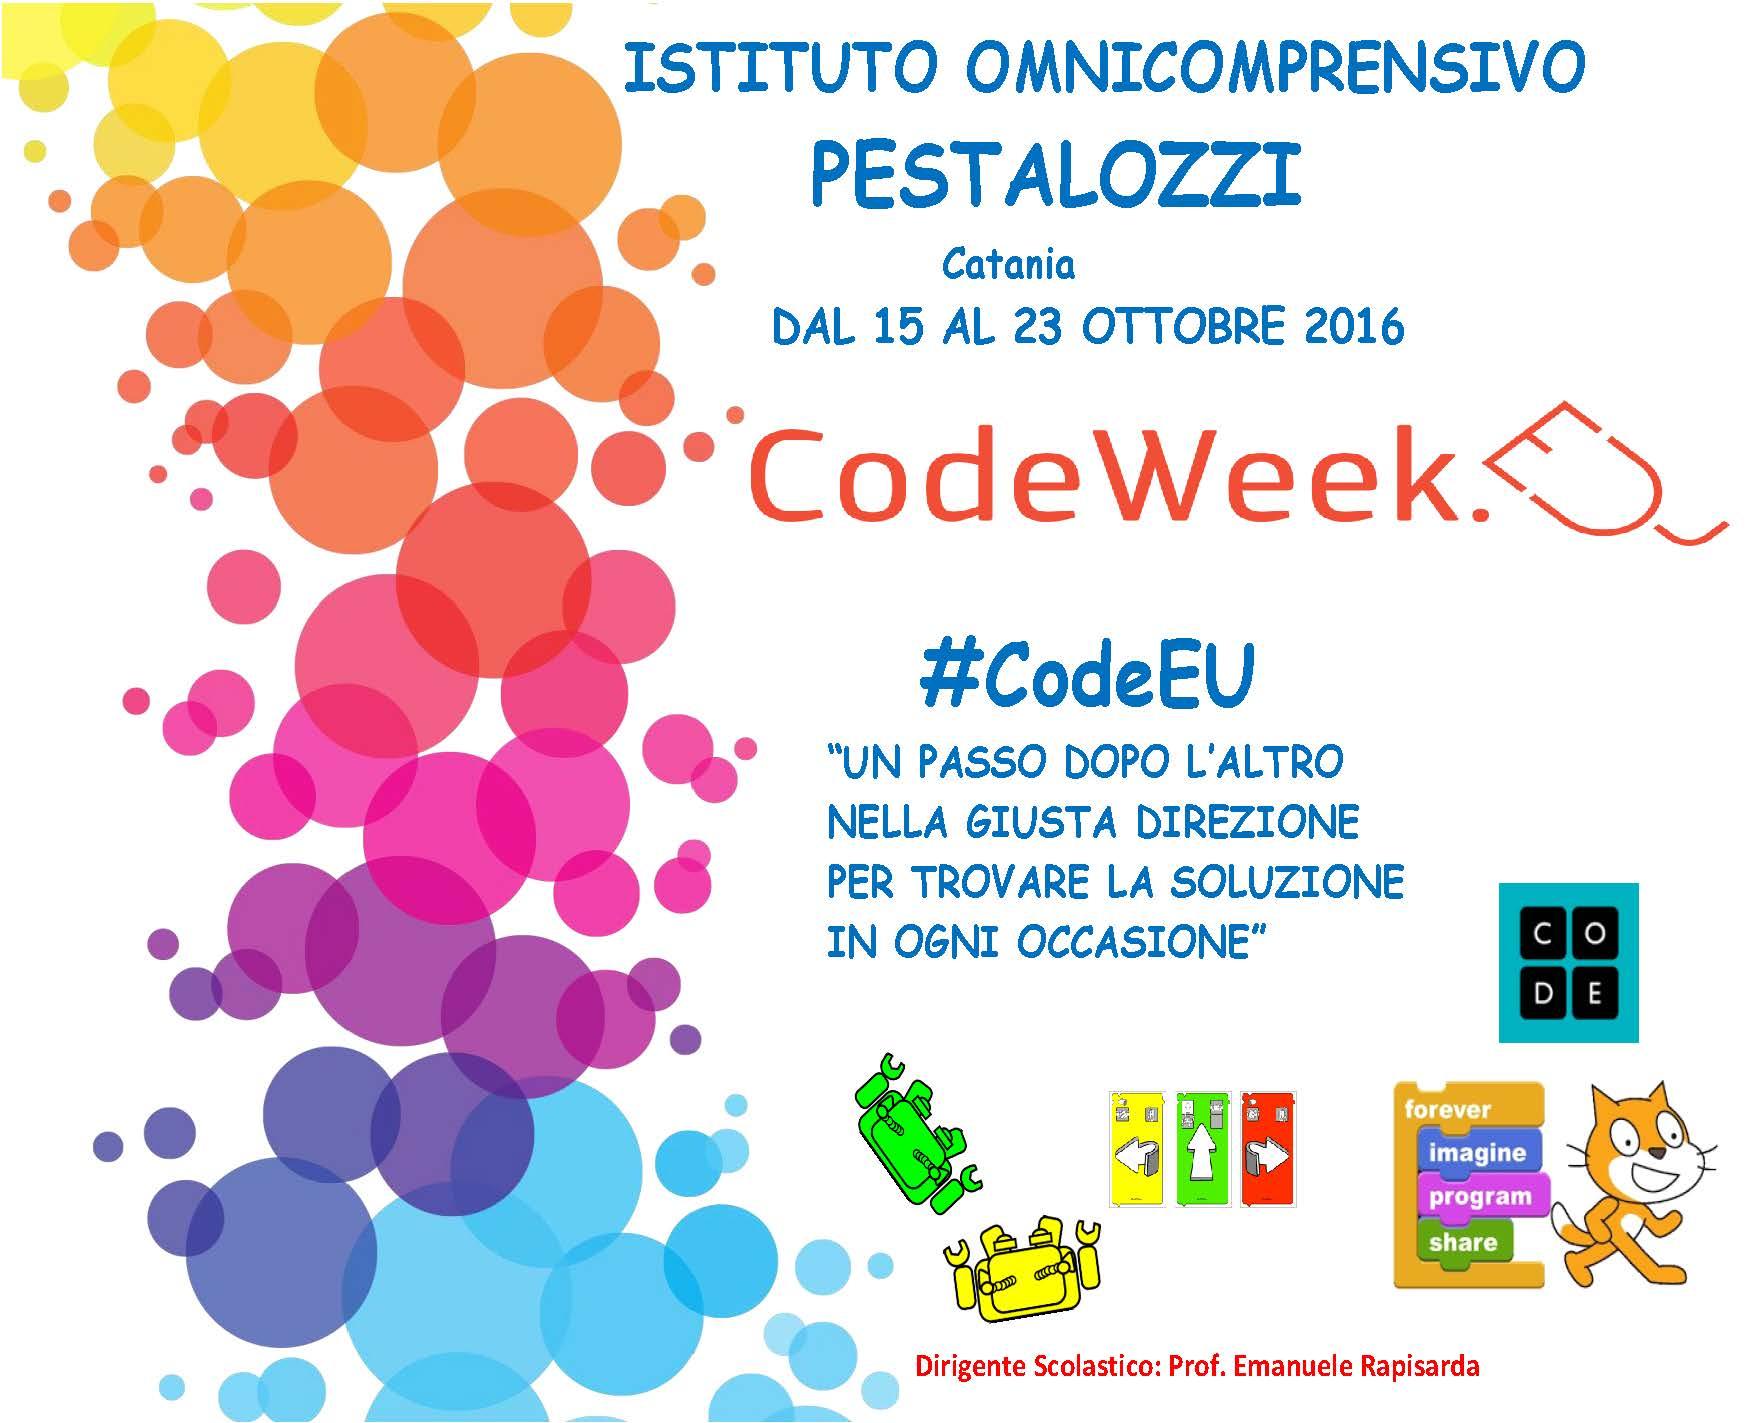 Locandina CodeWeek Pestalozzi 15-23 ottobre 2016